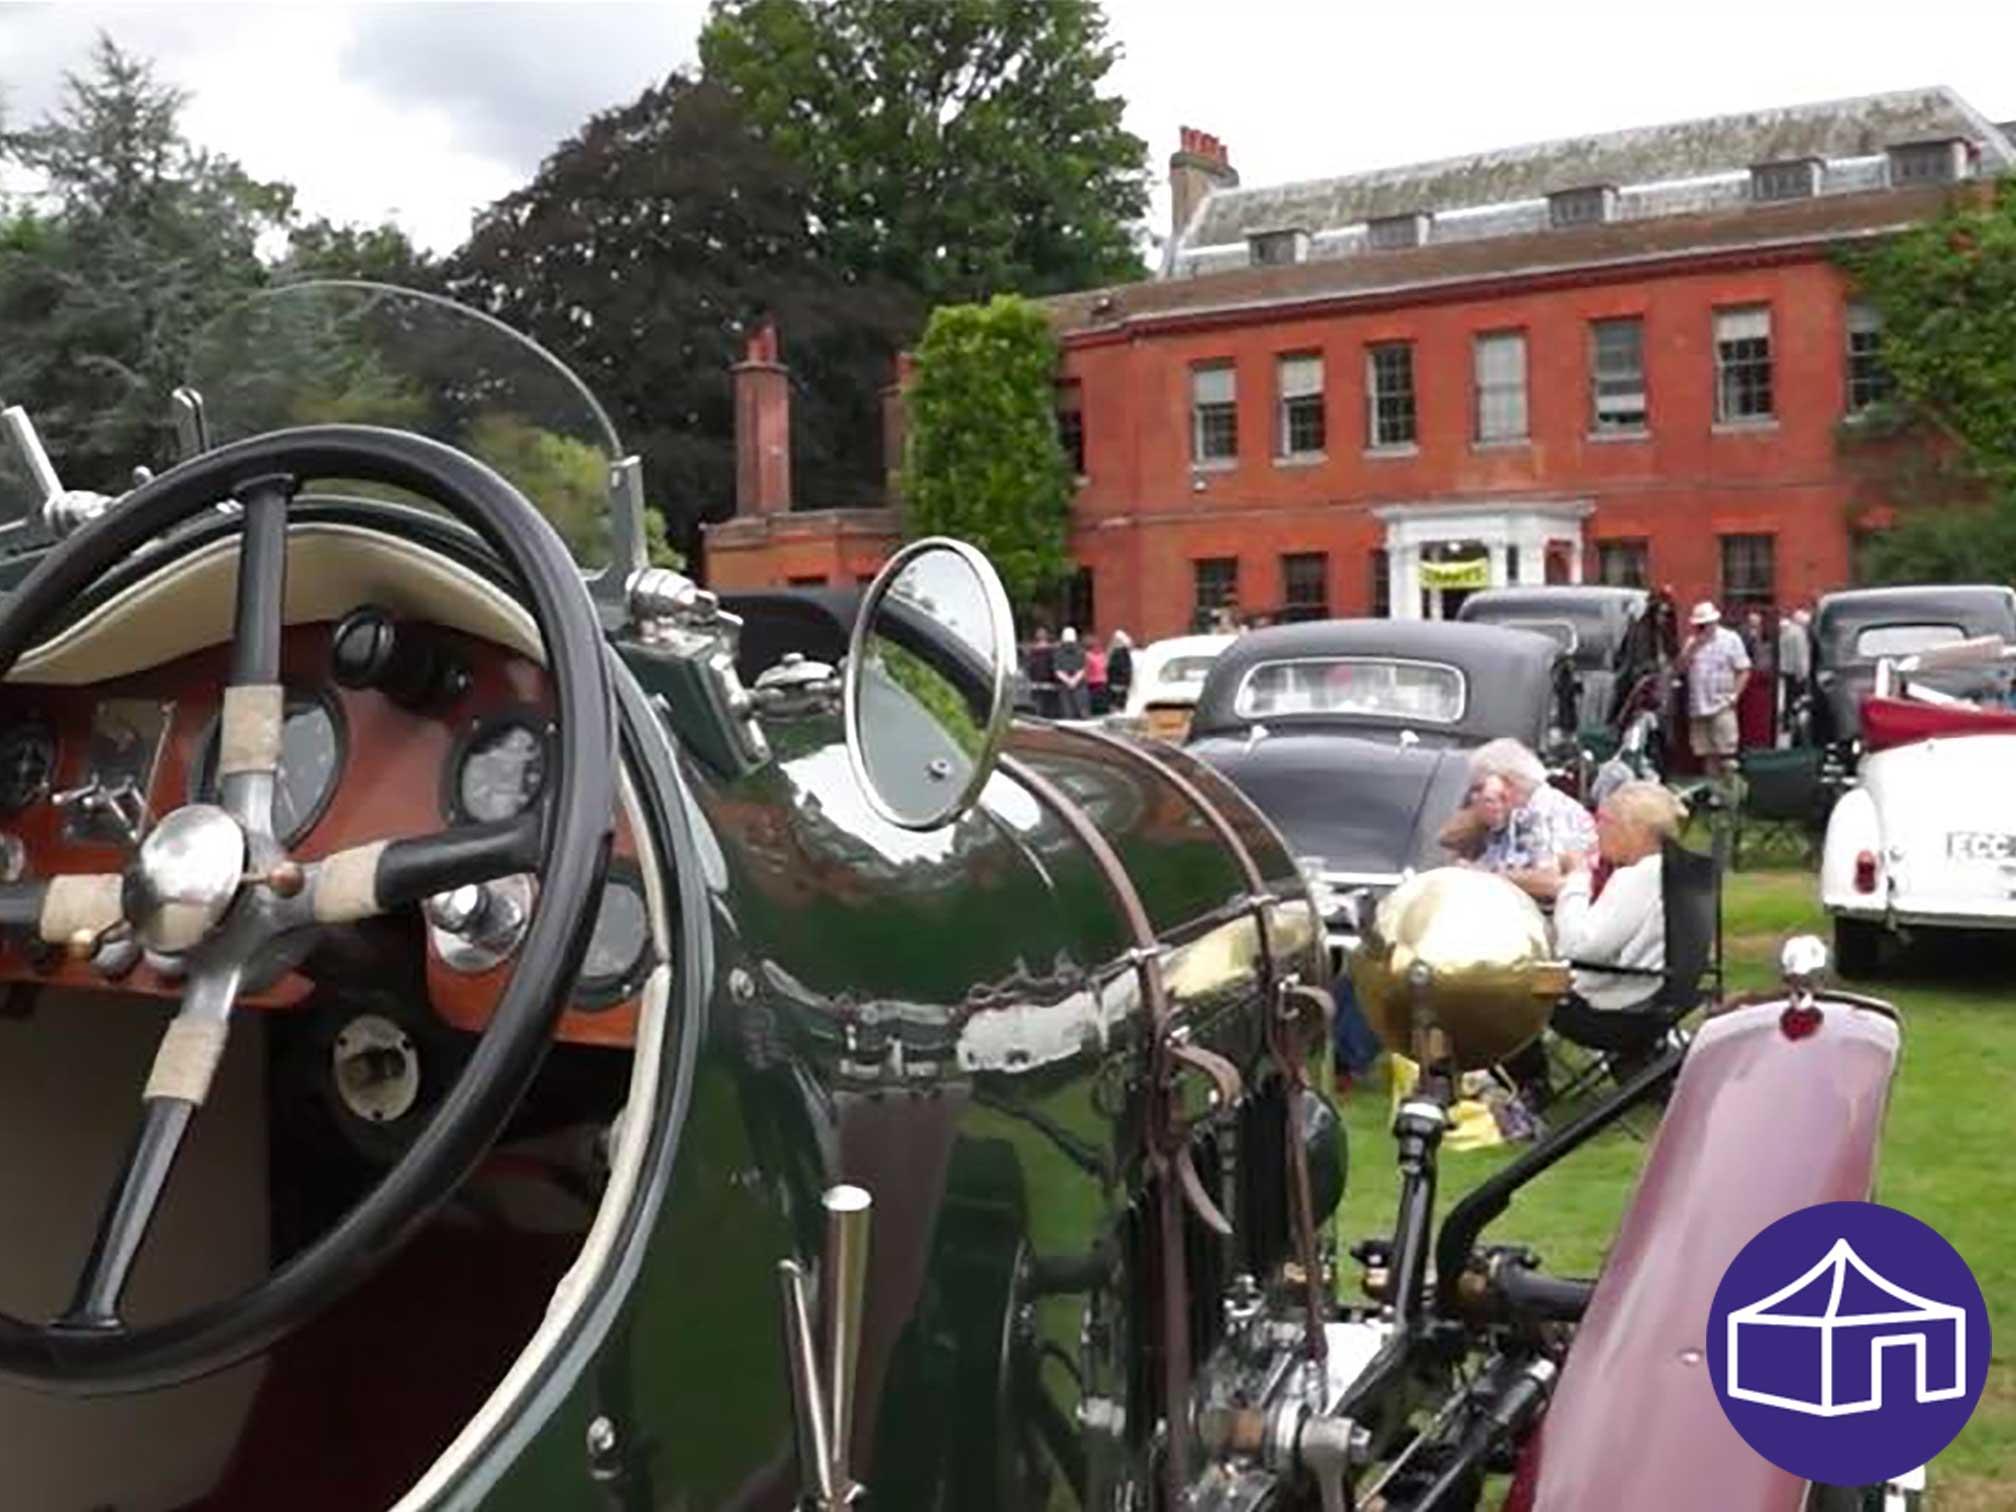 classcis_and_vintage_vehicle_show_capel_manor